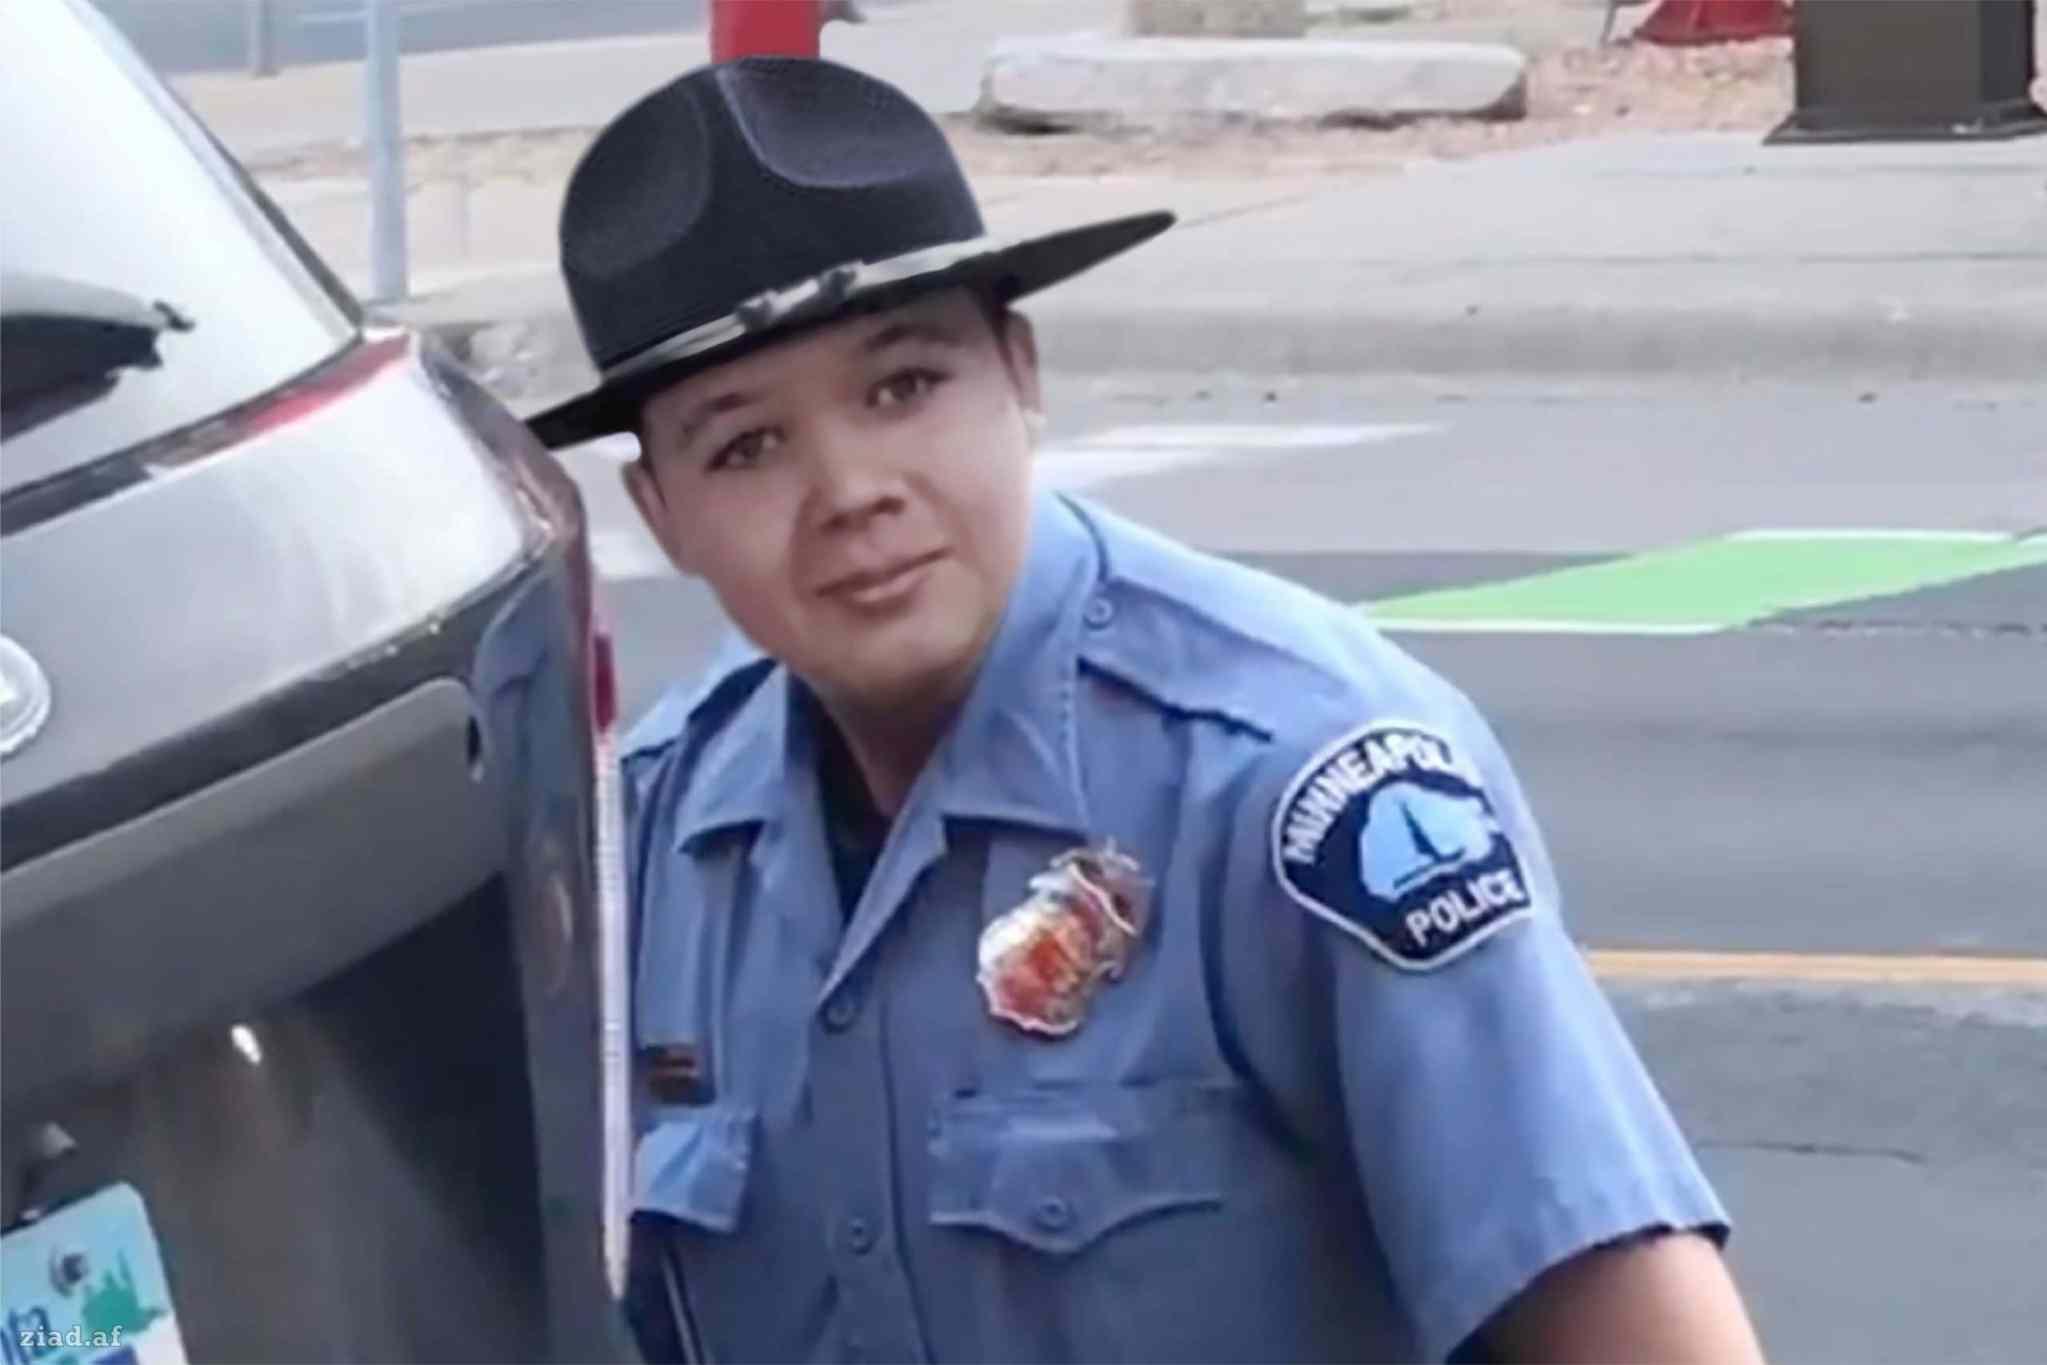 Officer in Training